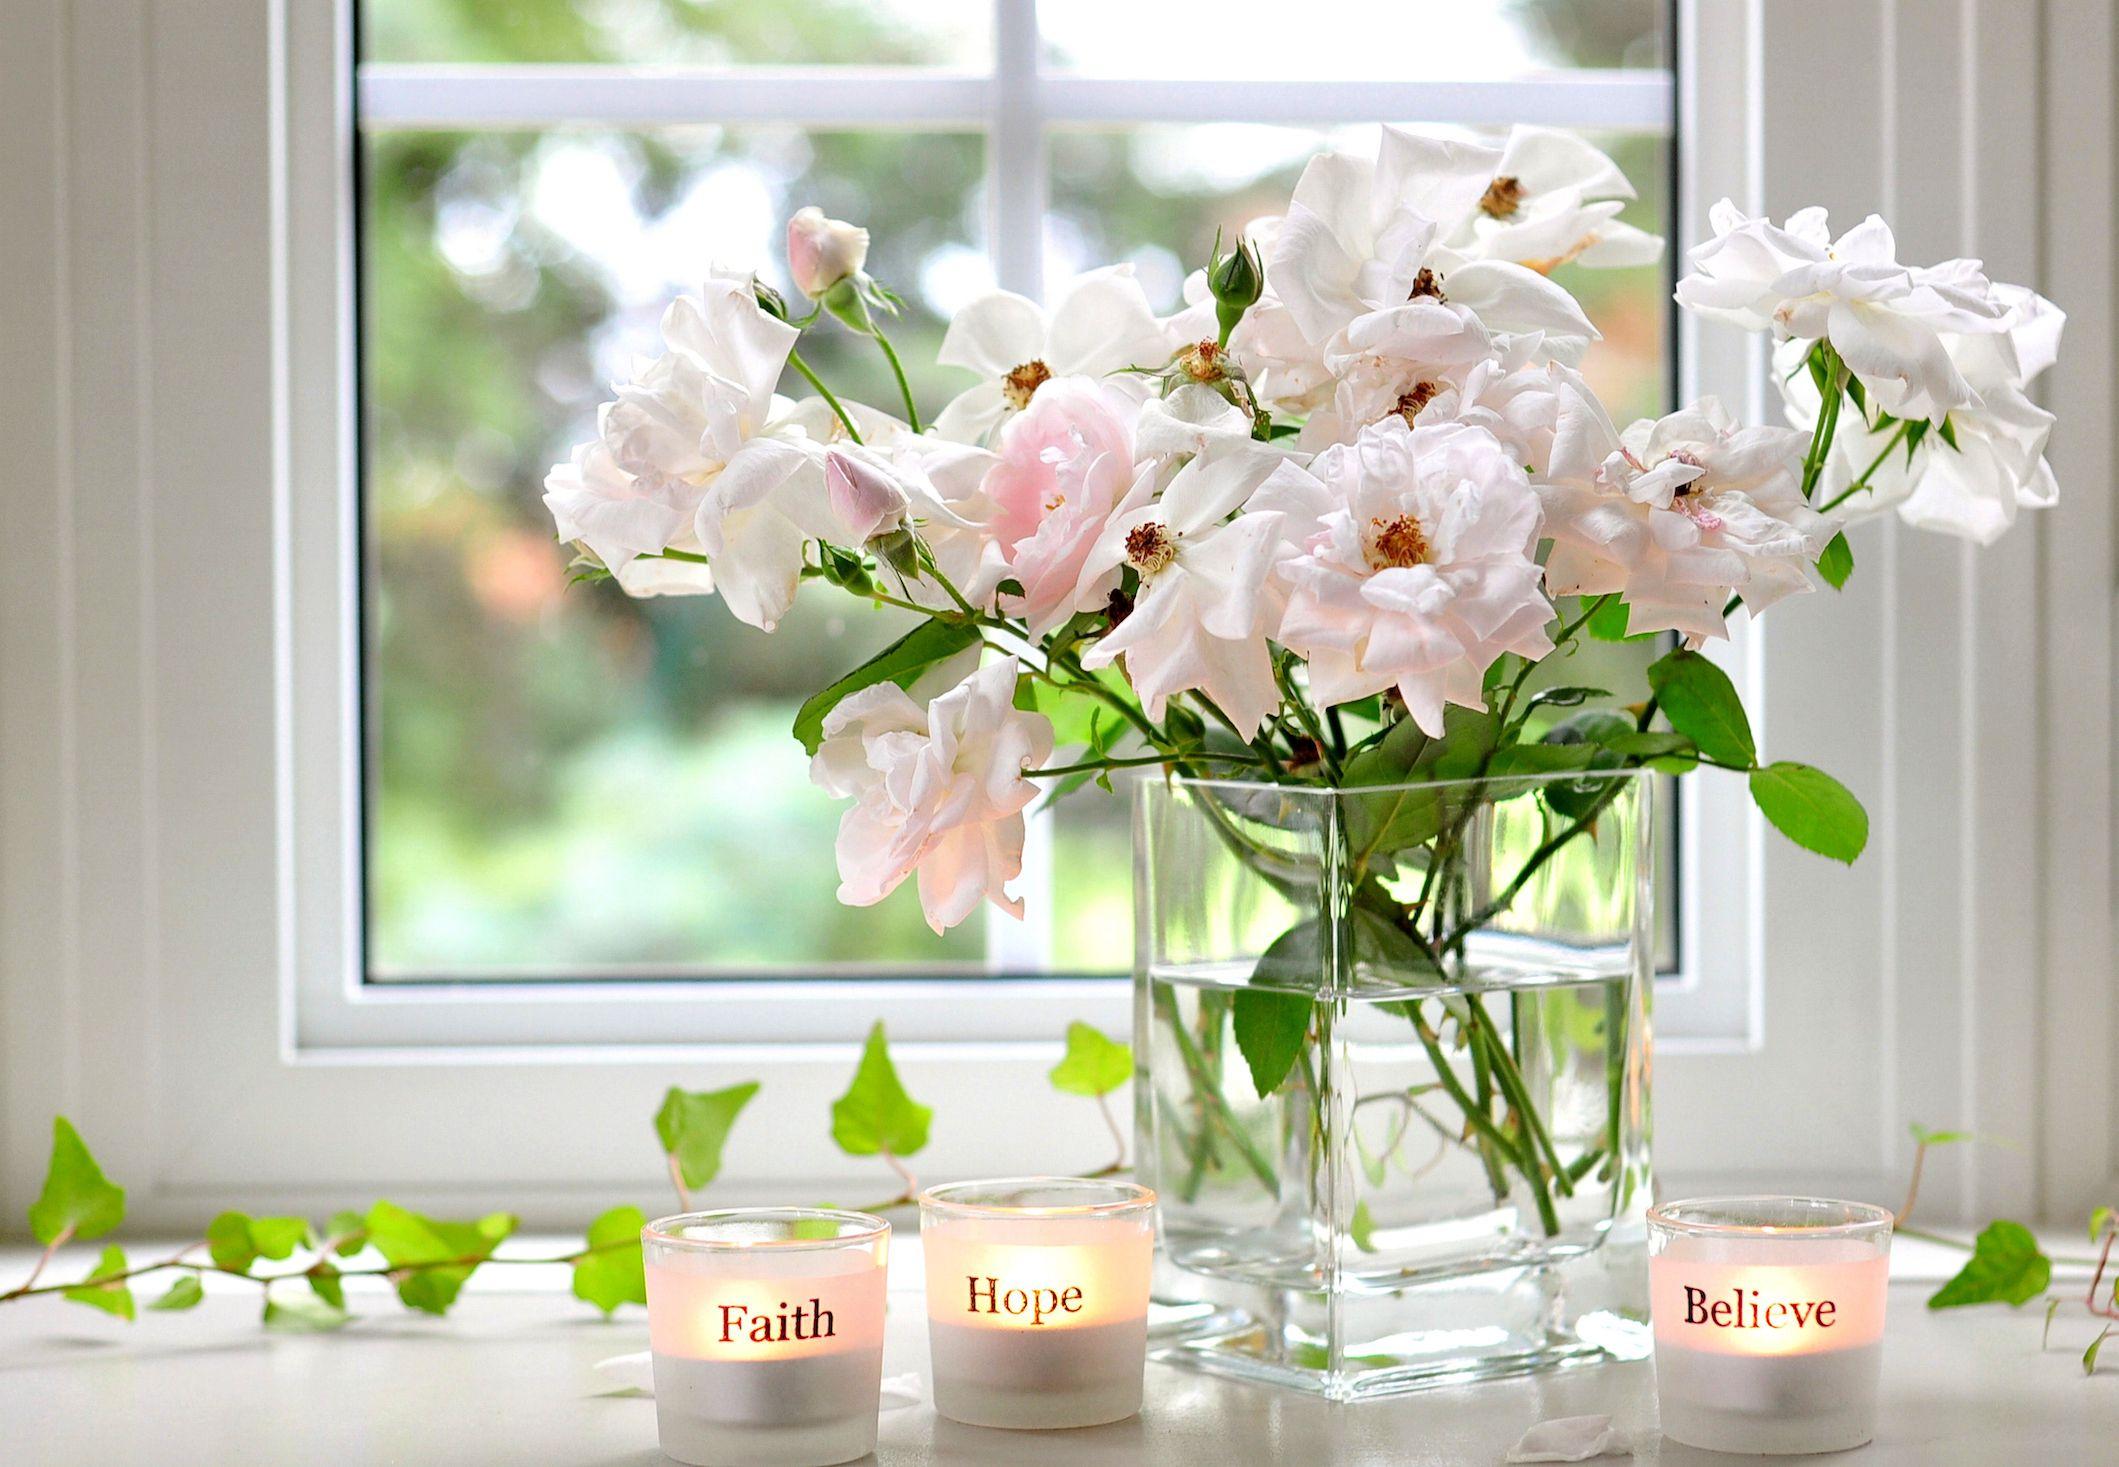 10 Feng Shui Steps To Create A Home Altar